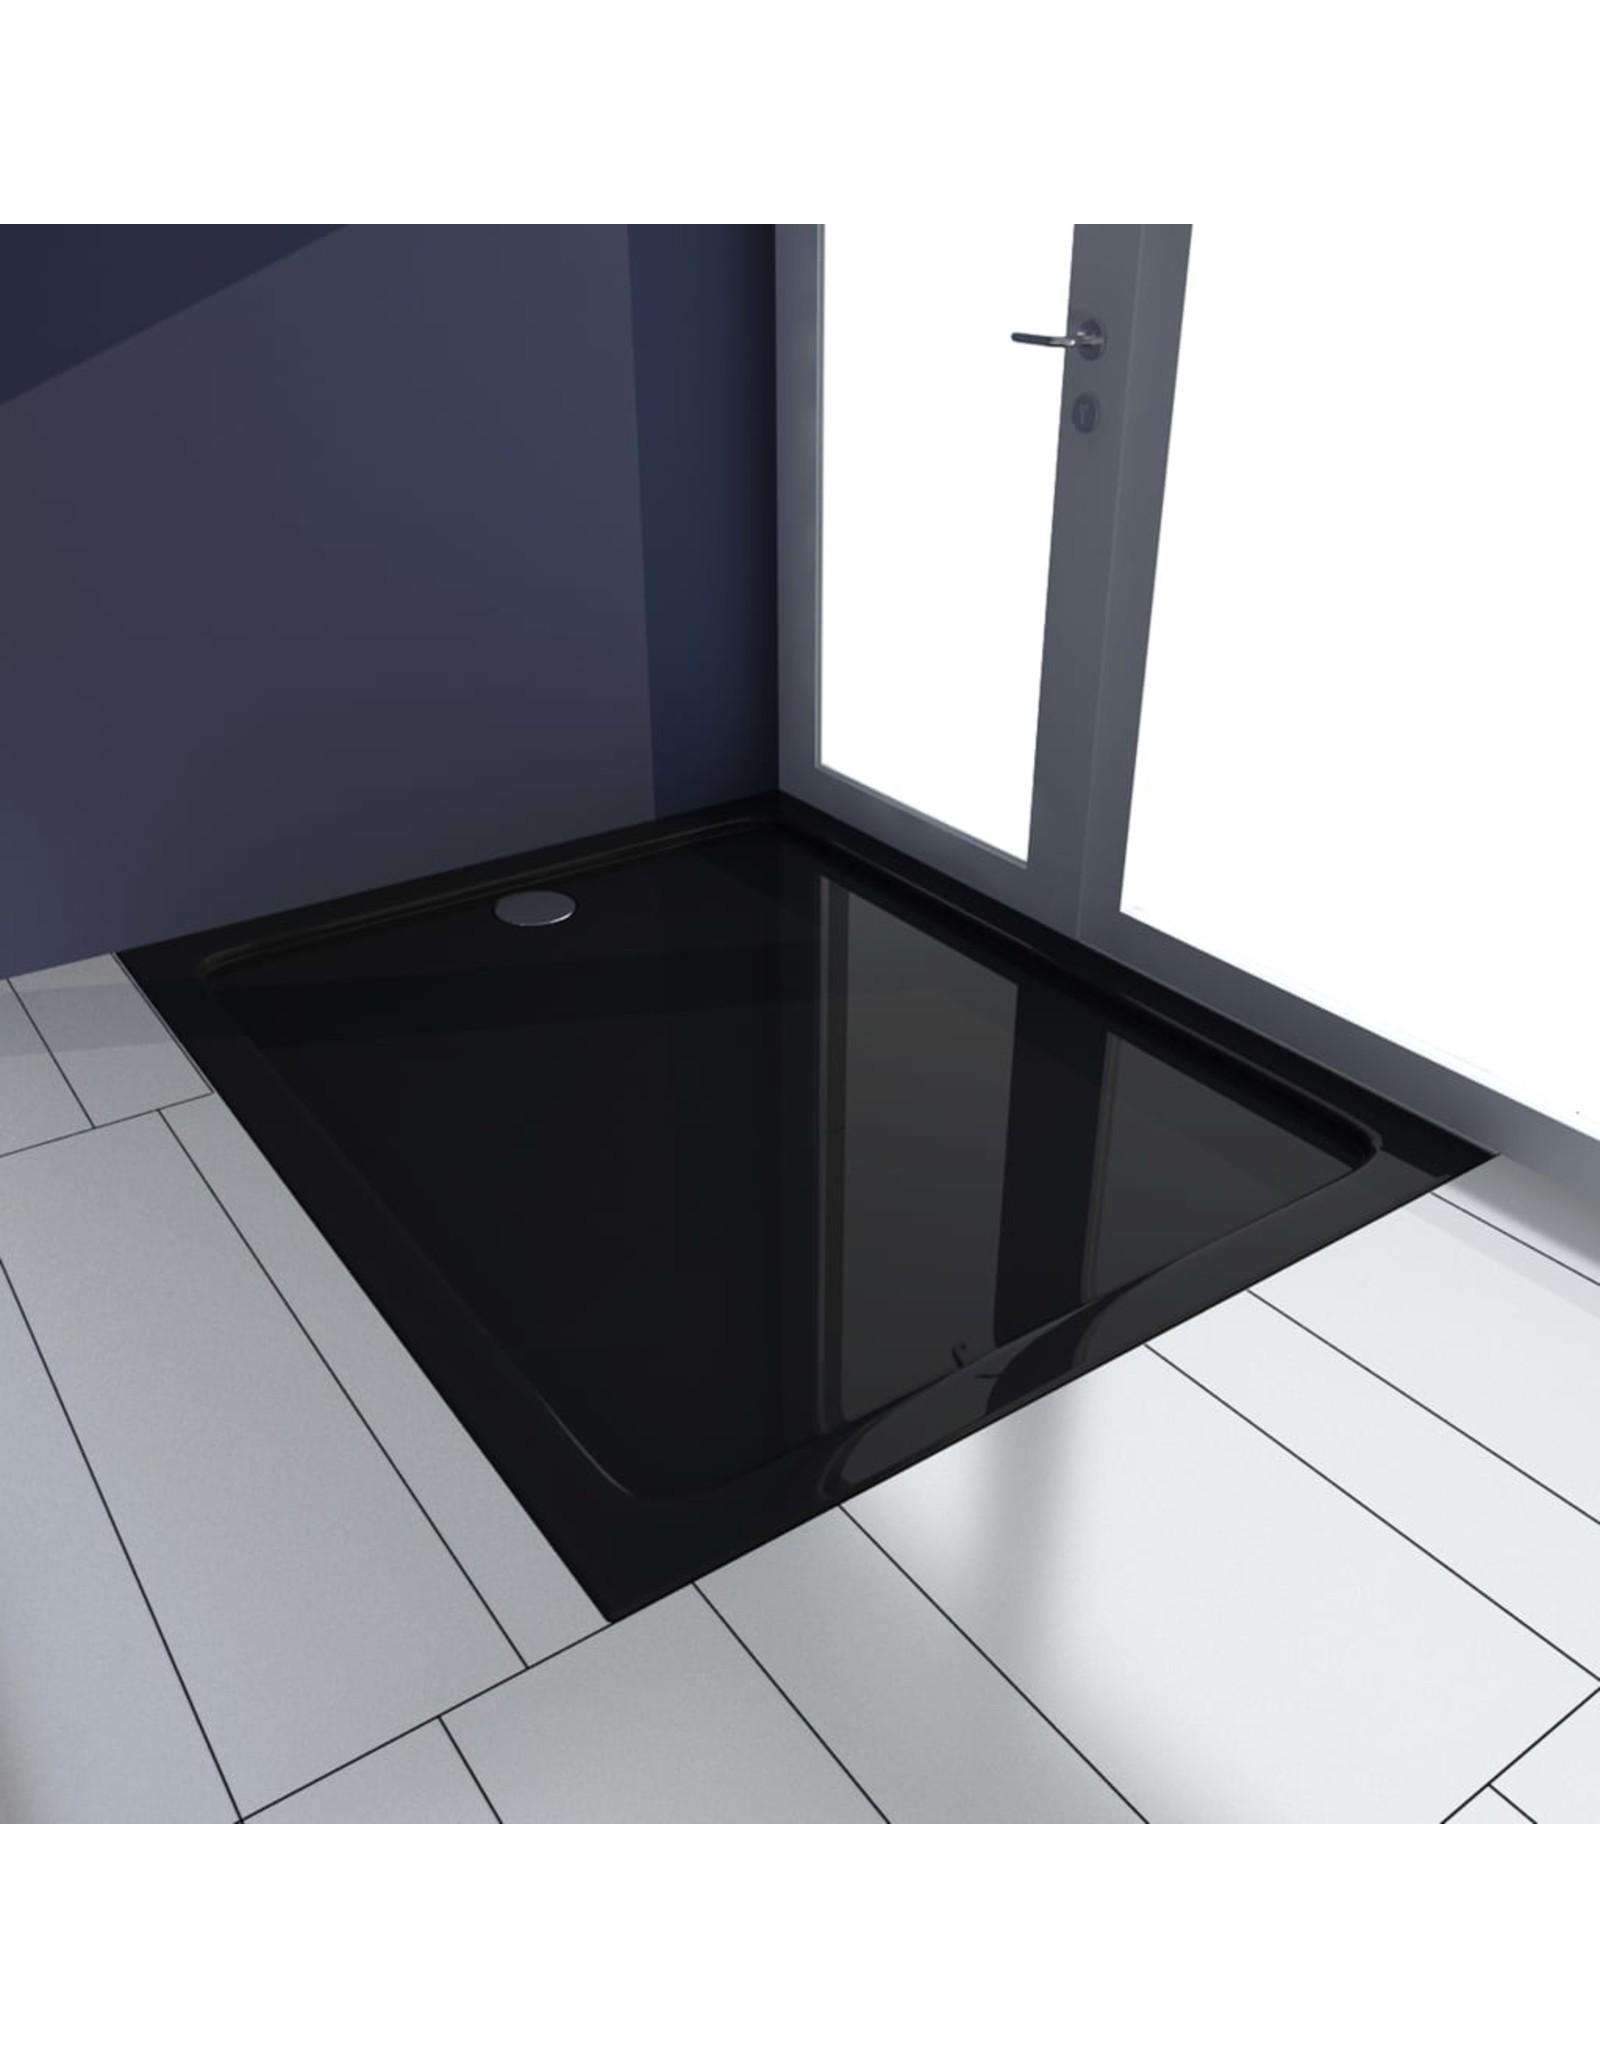 Douchebak 80x100 cm ABS zwart